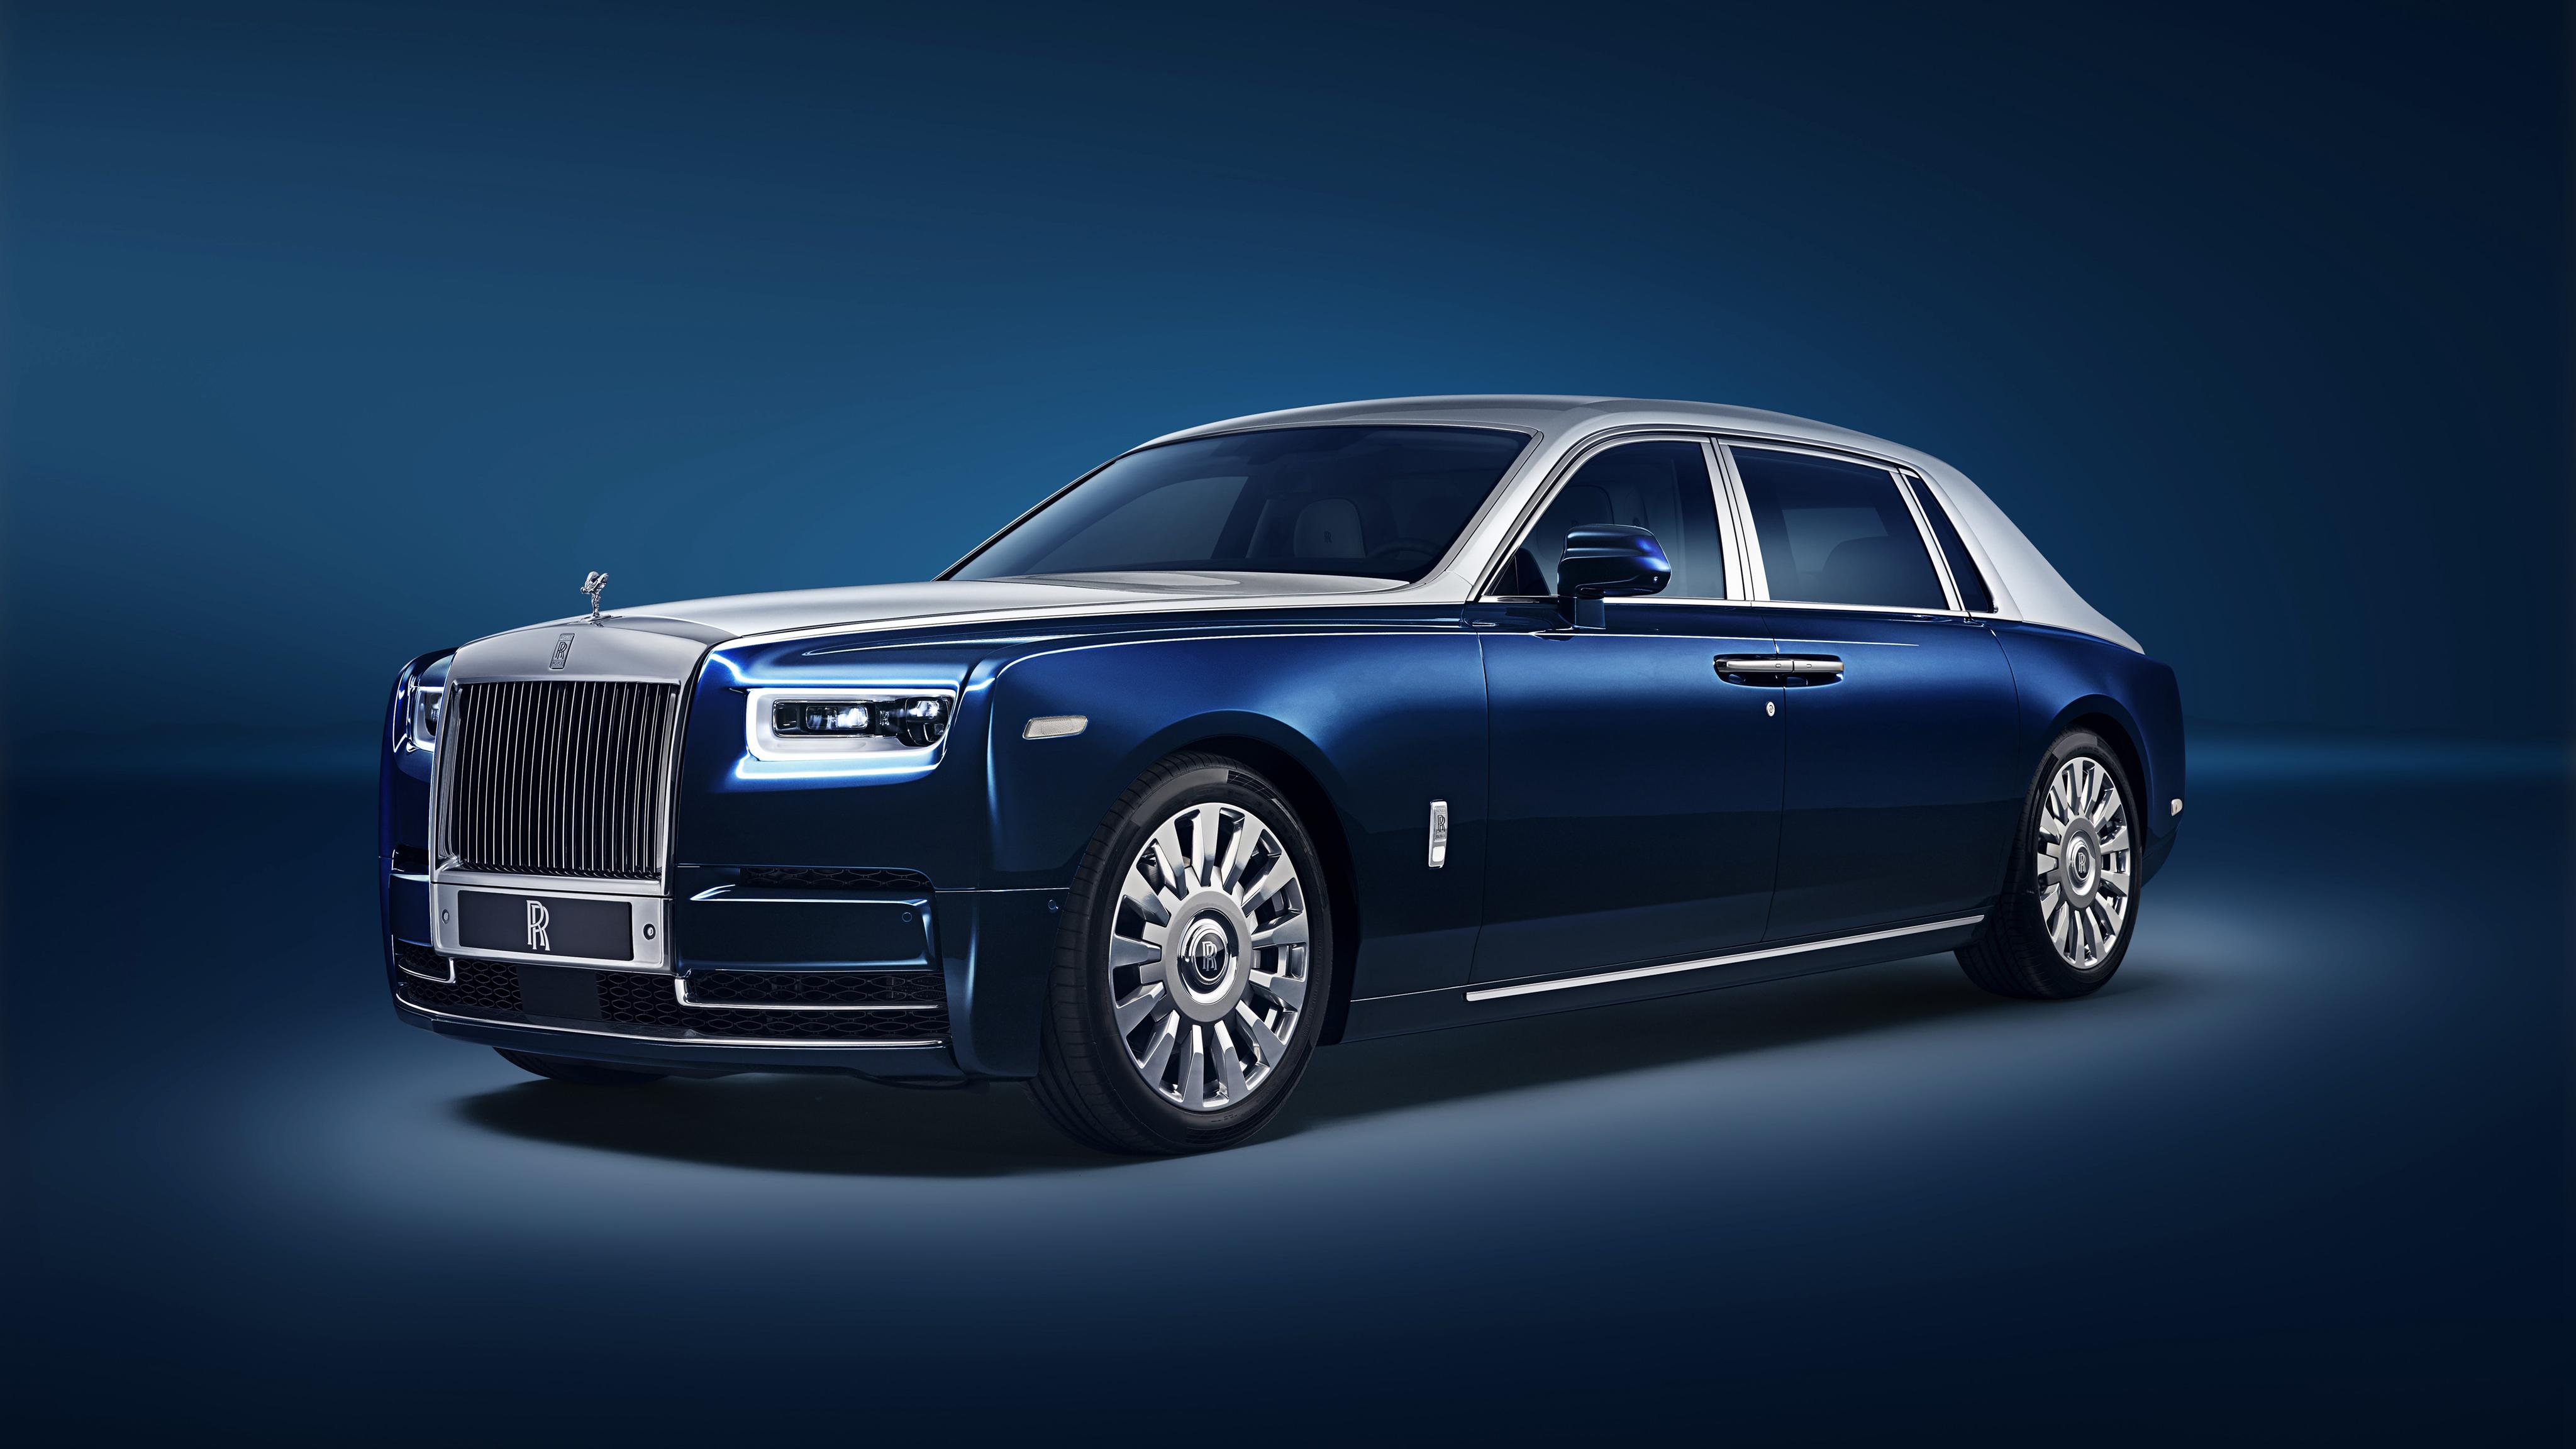 56 Rolls Royce Phantom Wallpapers On Wallpapersafari